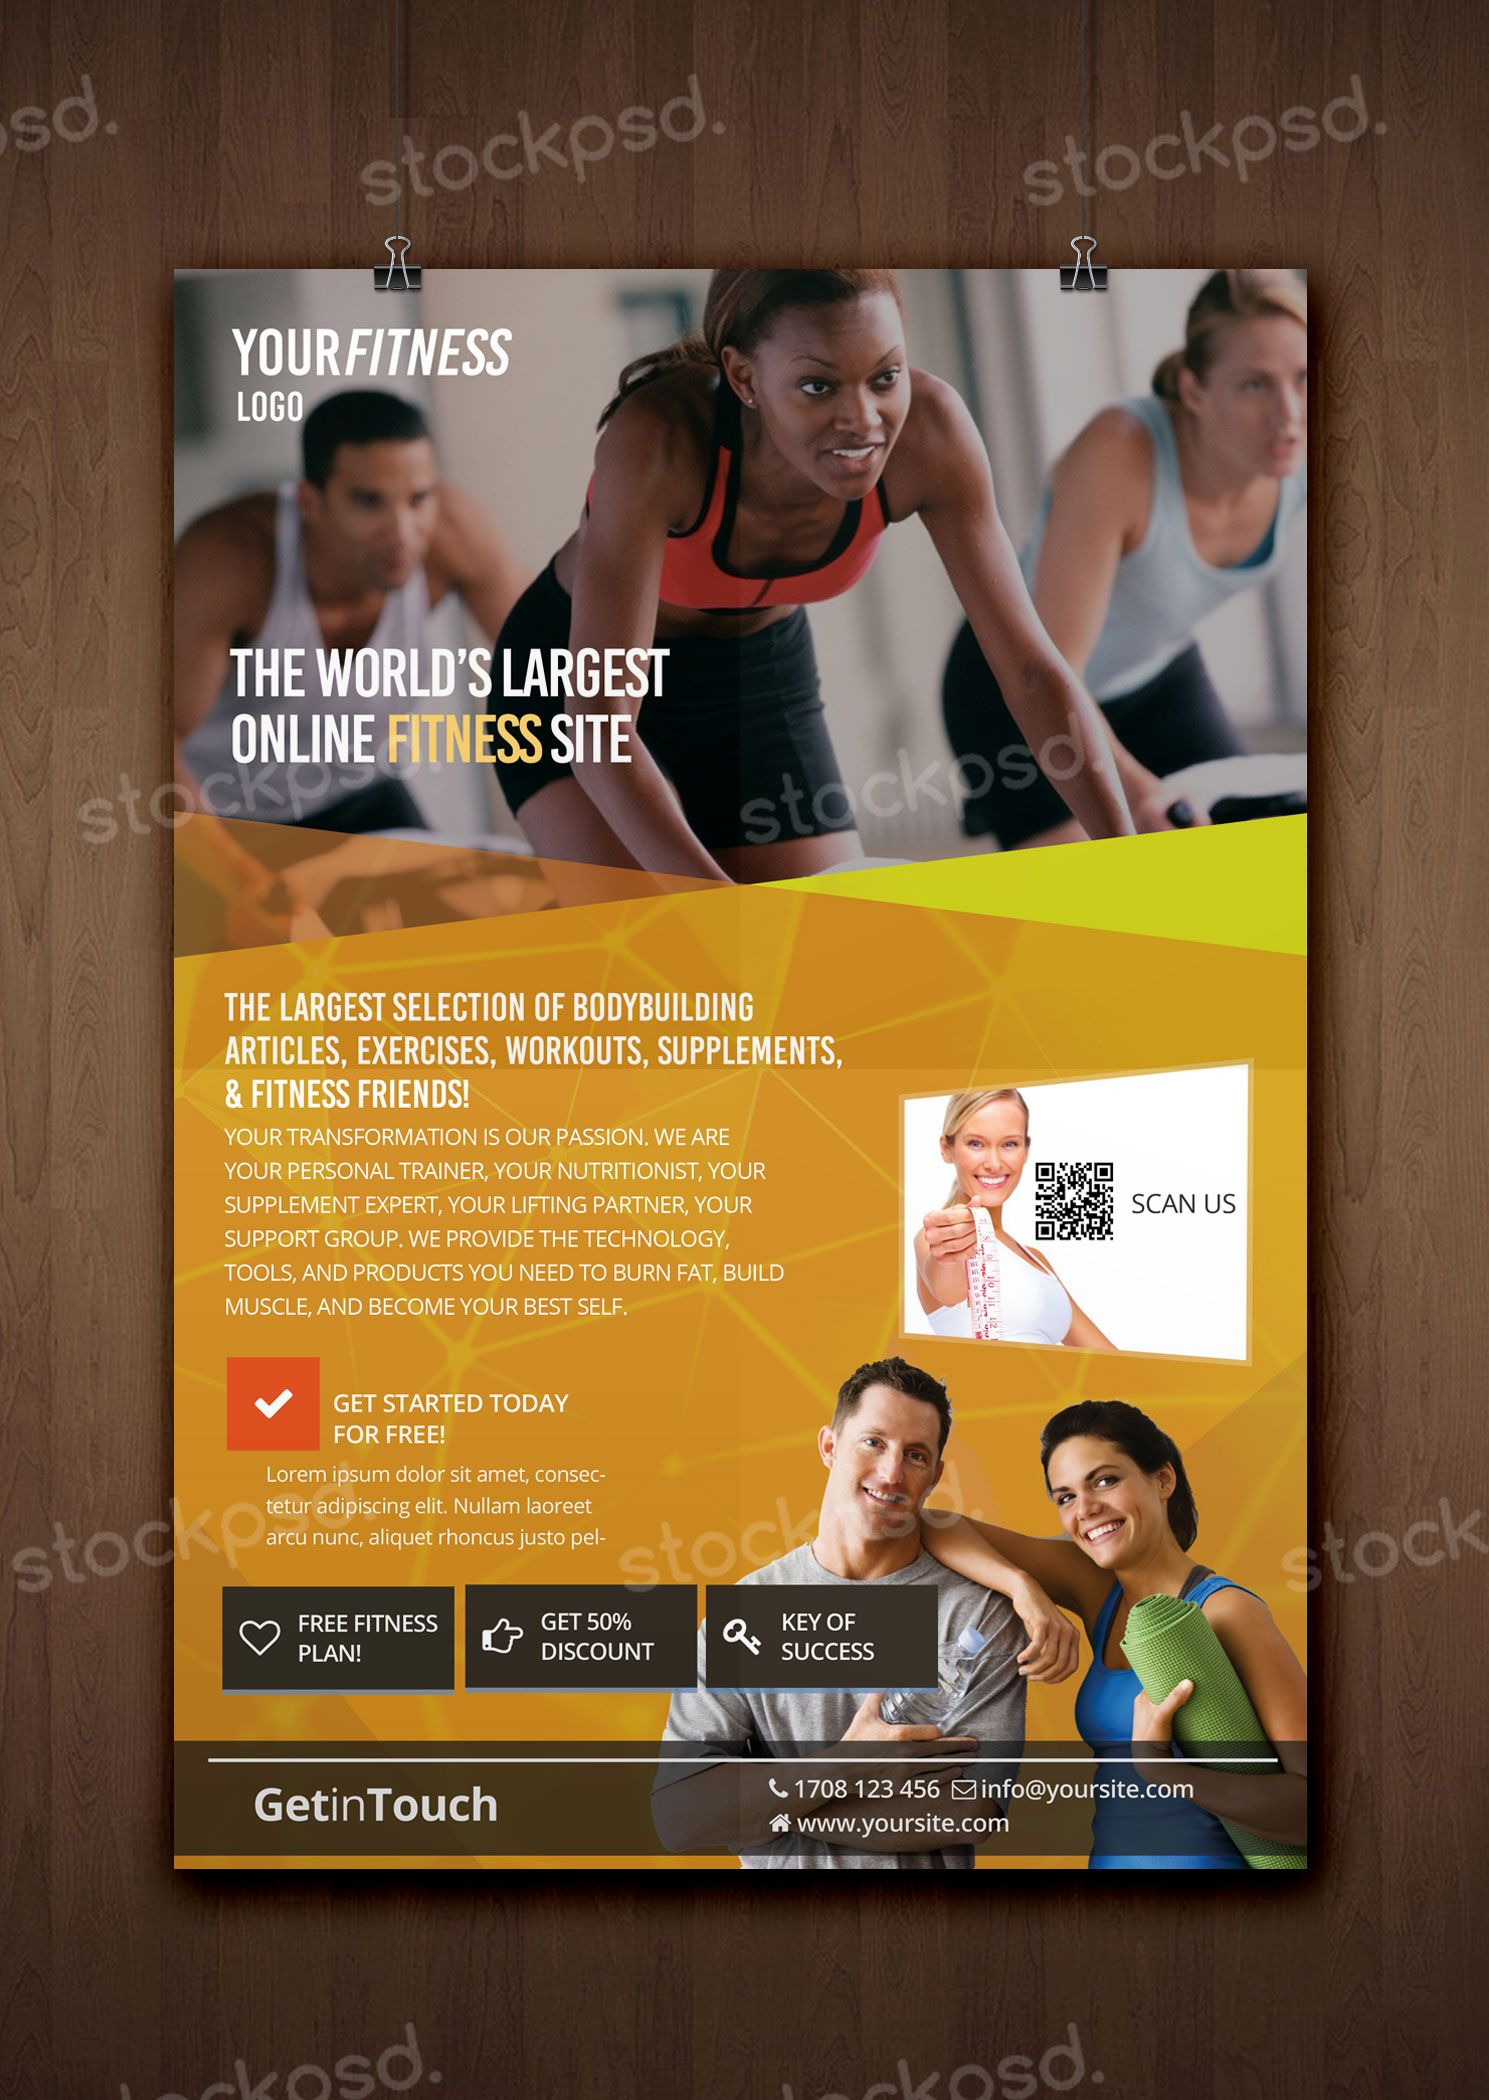 Fitness, Gym U0026 Health   FREE PSD Flyer Template   Free PSD Flyer Templates  To